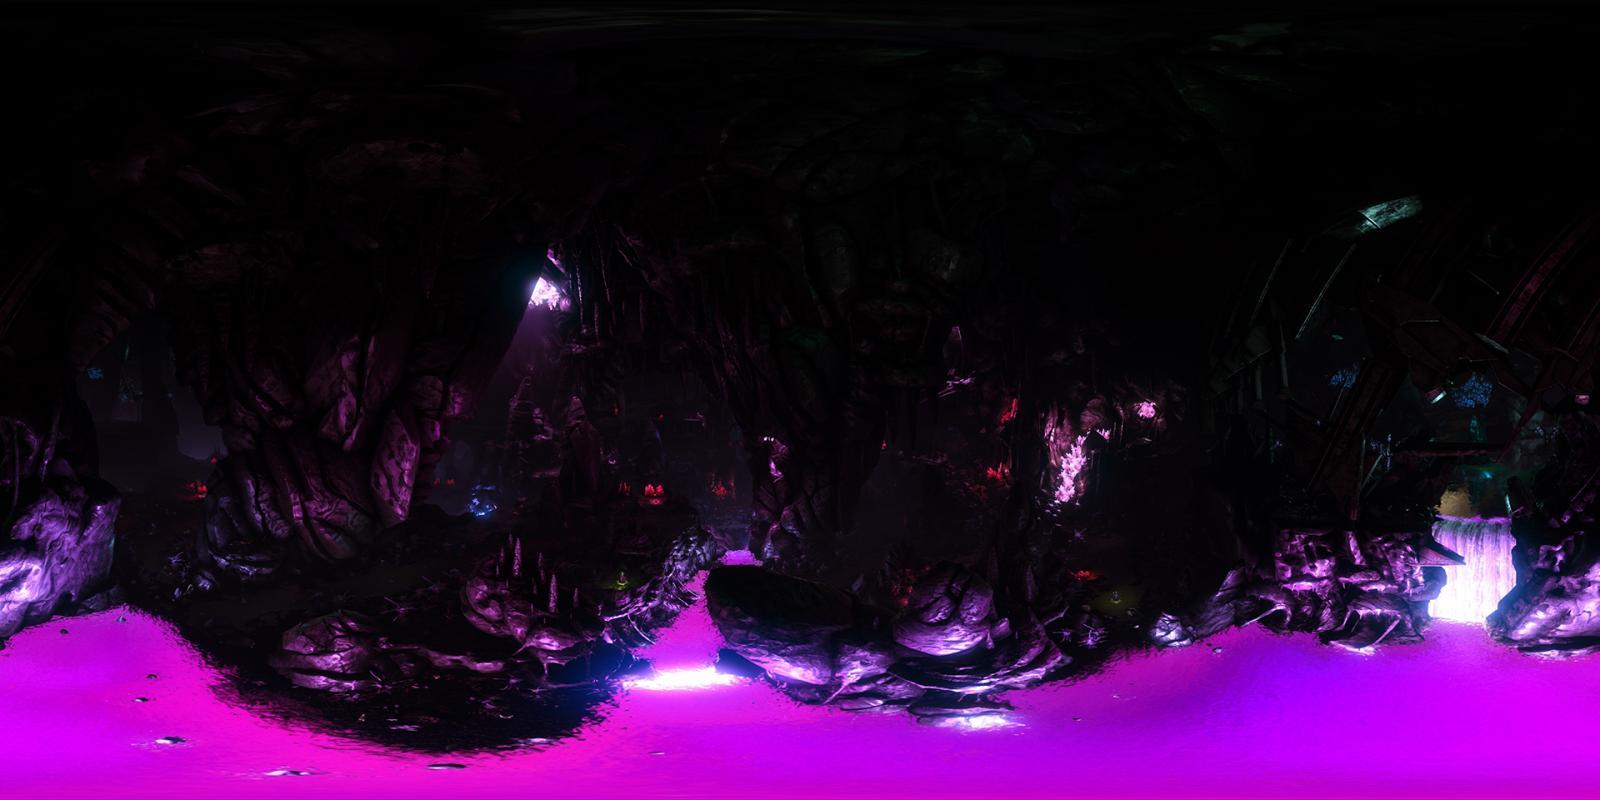 large.5a7f44322f3dd_EXFIB0-PinkRiver-360Stereo.jpg